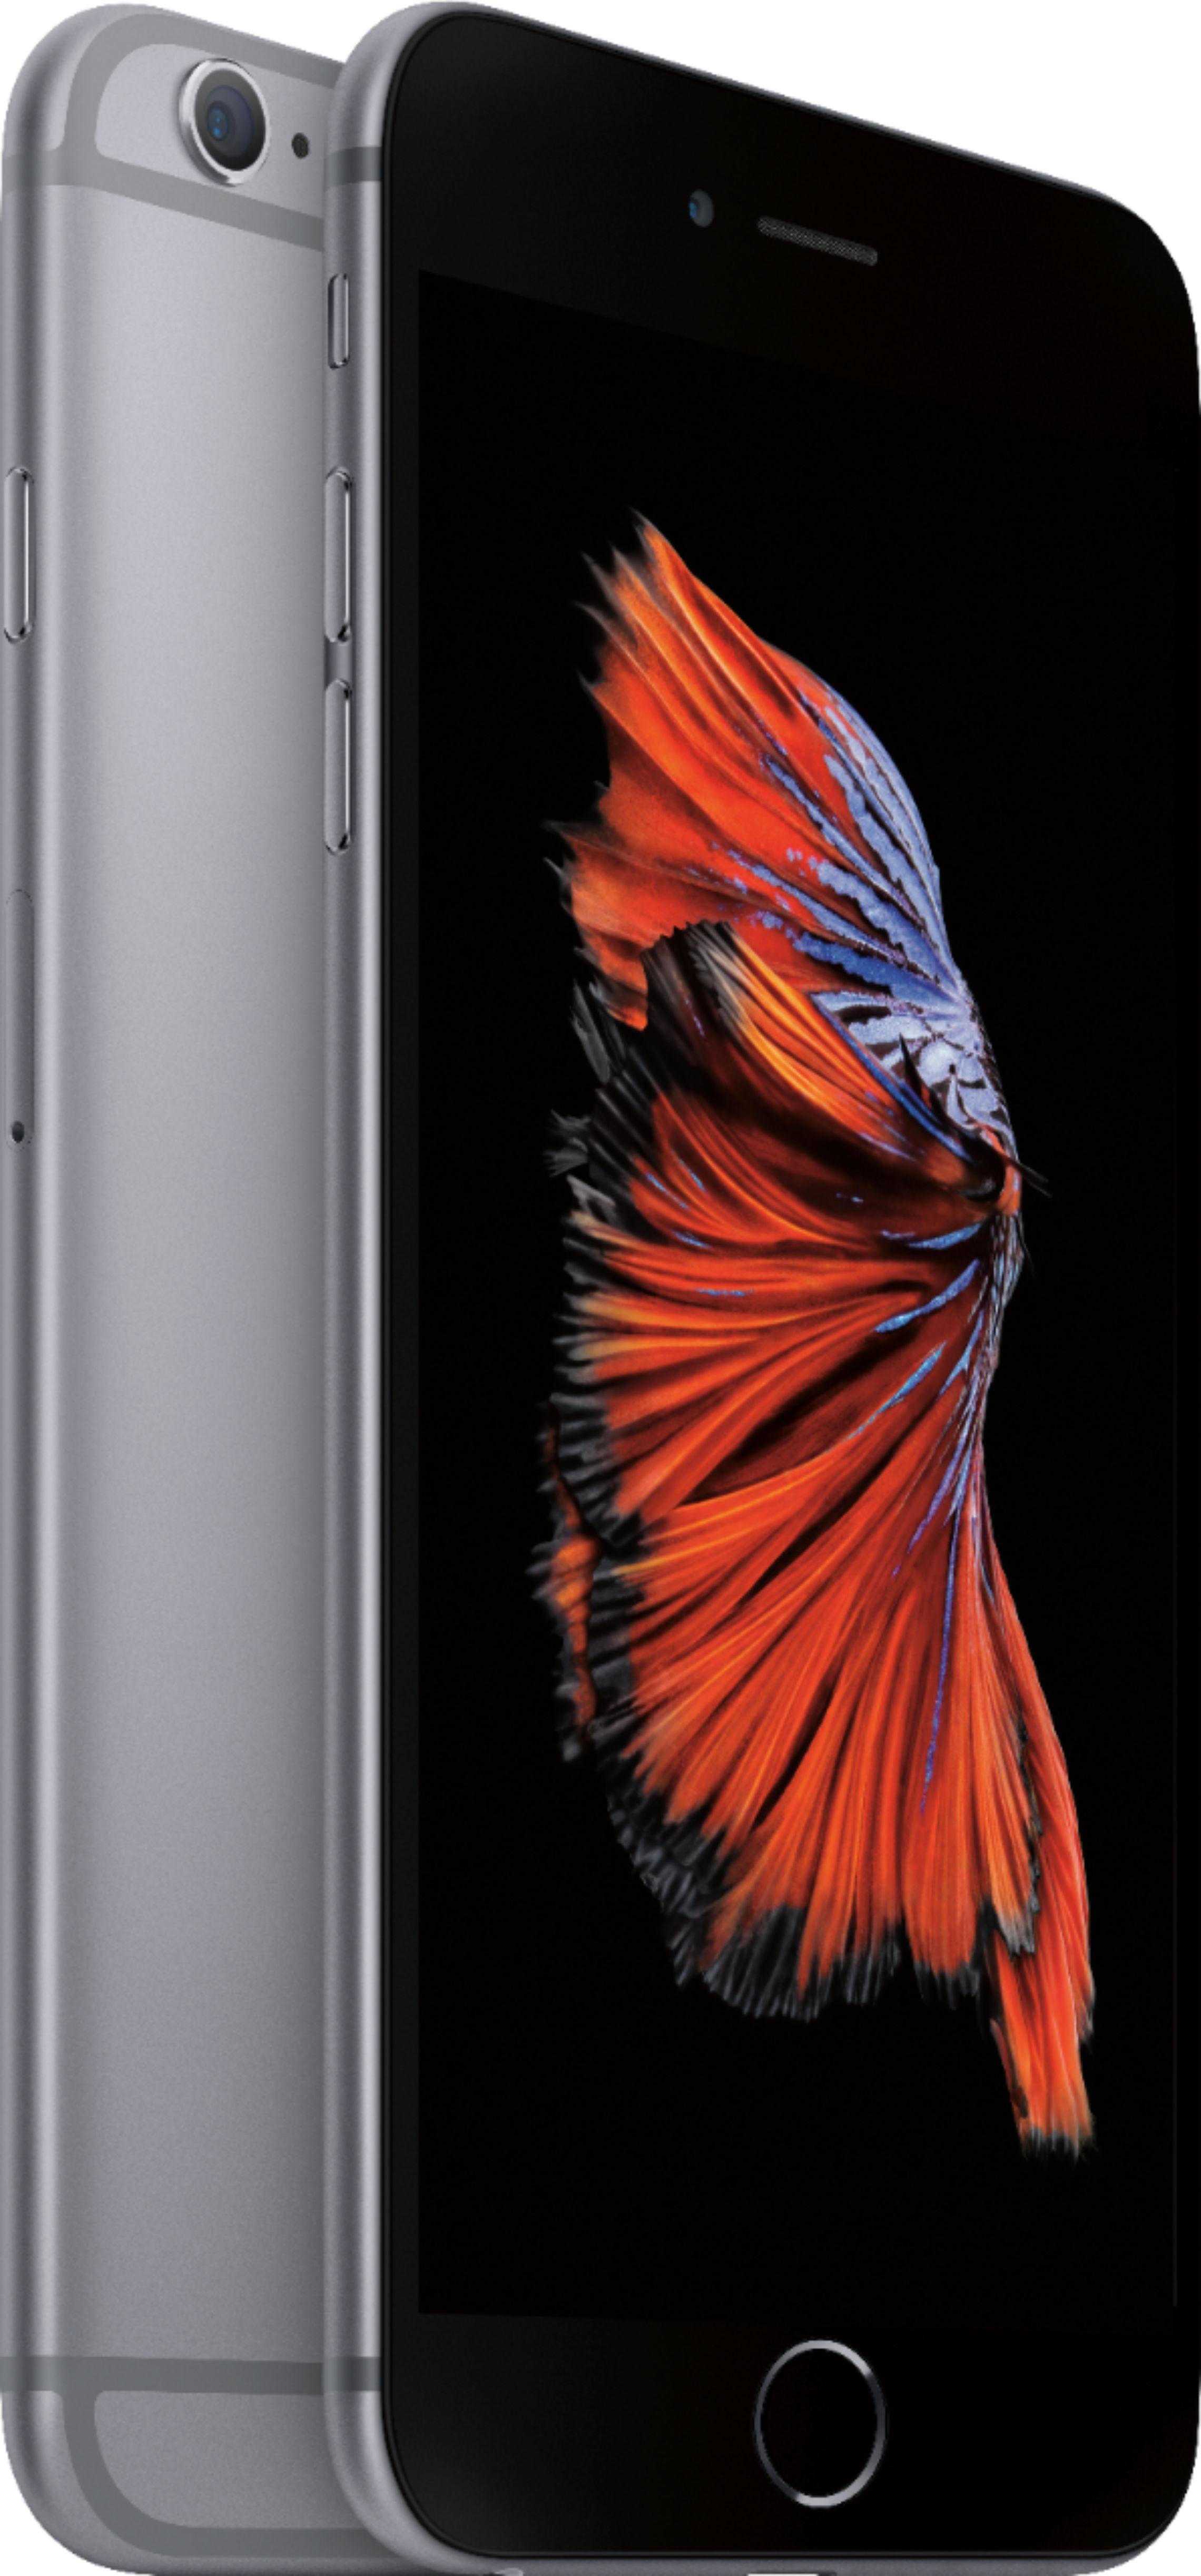 Apple iPhone 6 Plus 64GB Space Gray